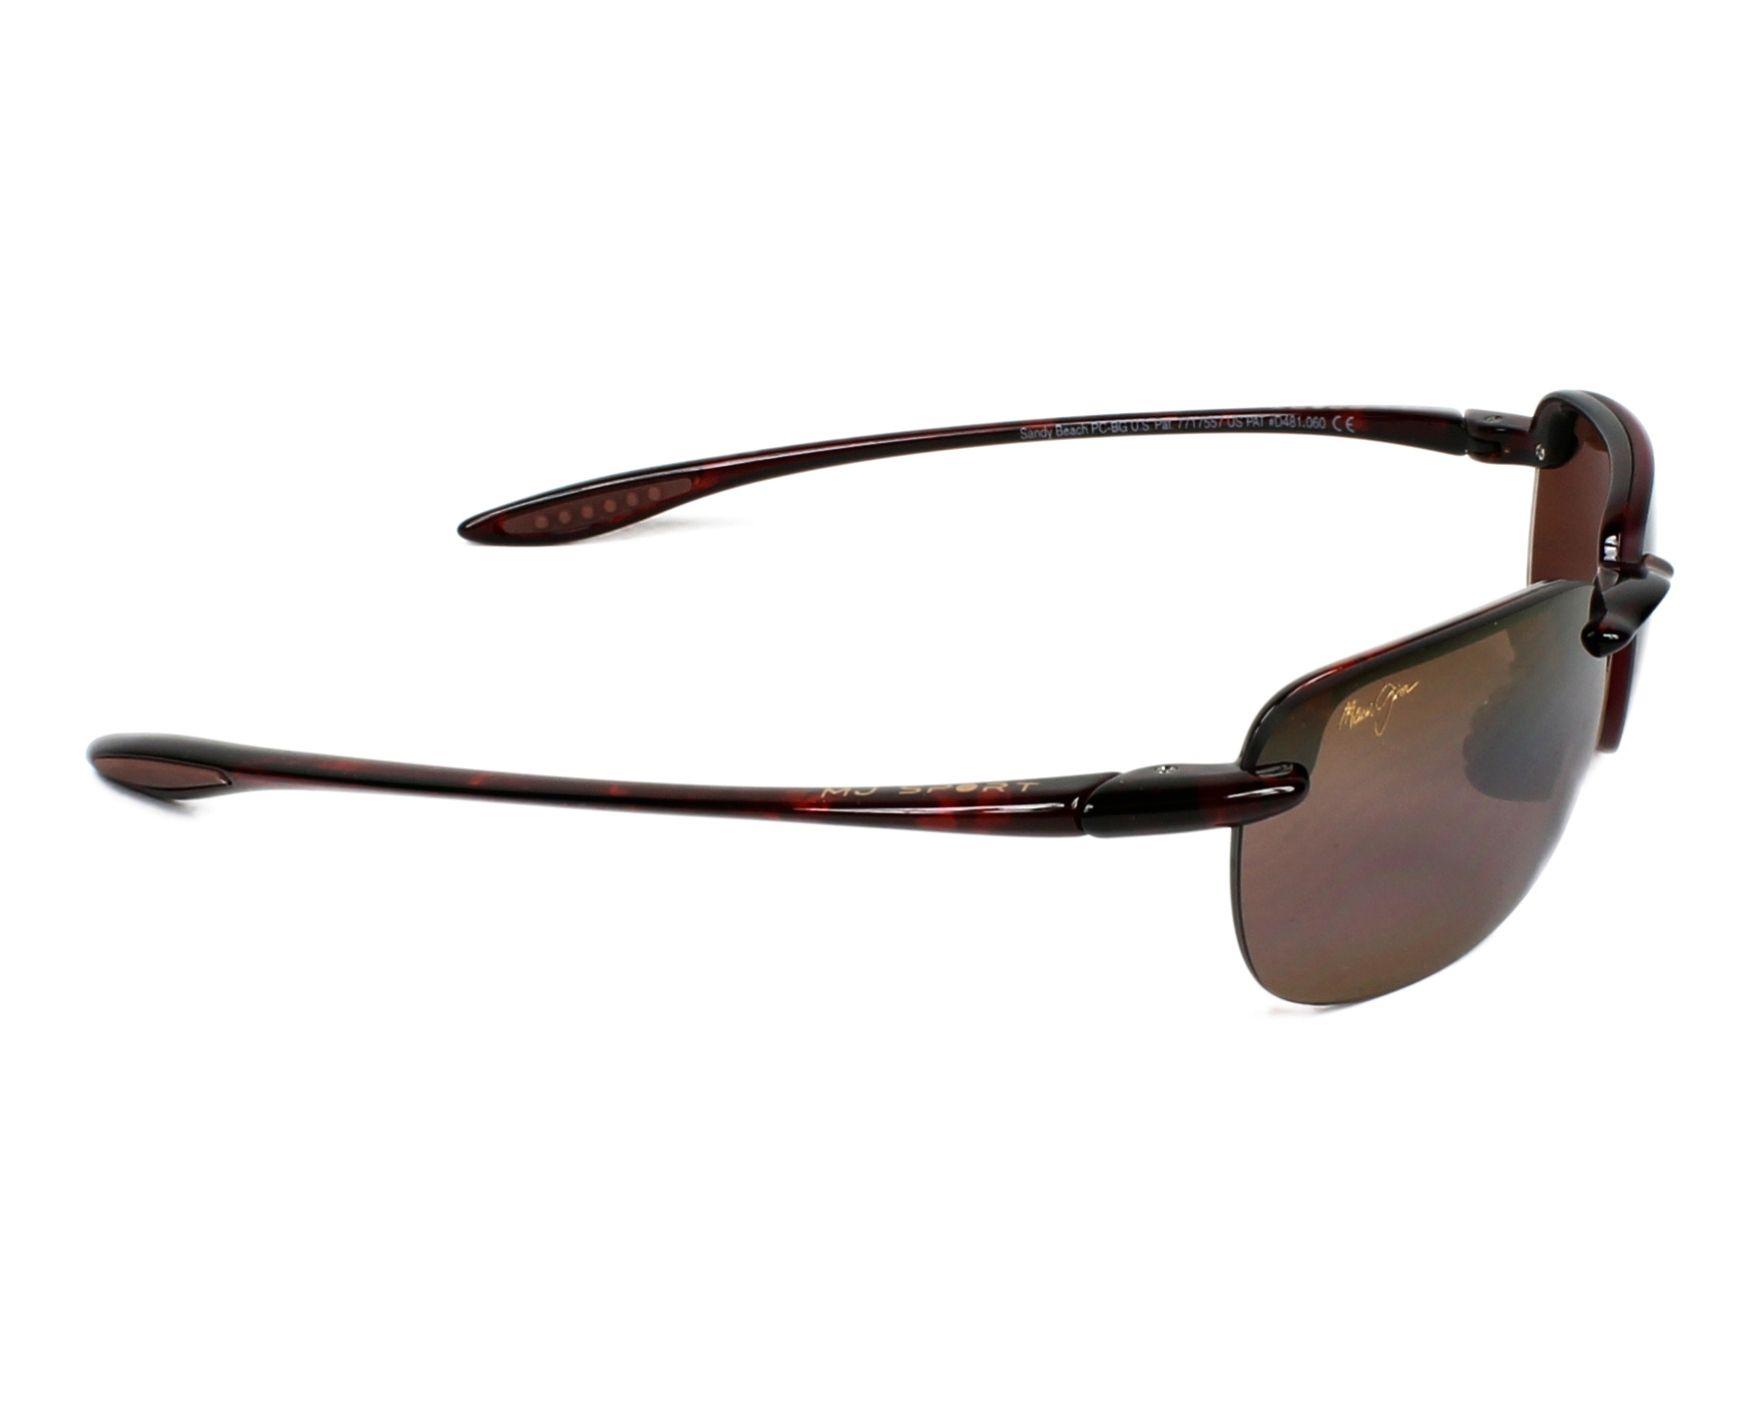 9e9cc6801a Gafas de sol Maui Jim H-408 10 56-15 Havana vista lateral